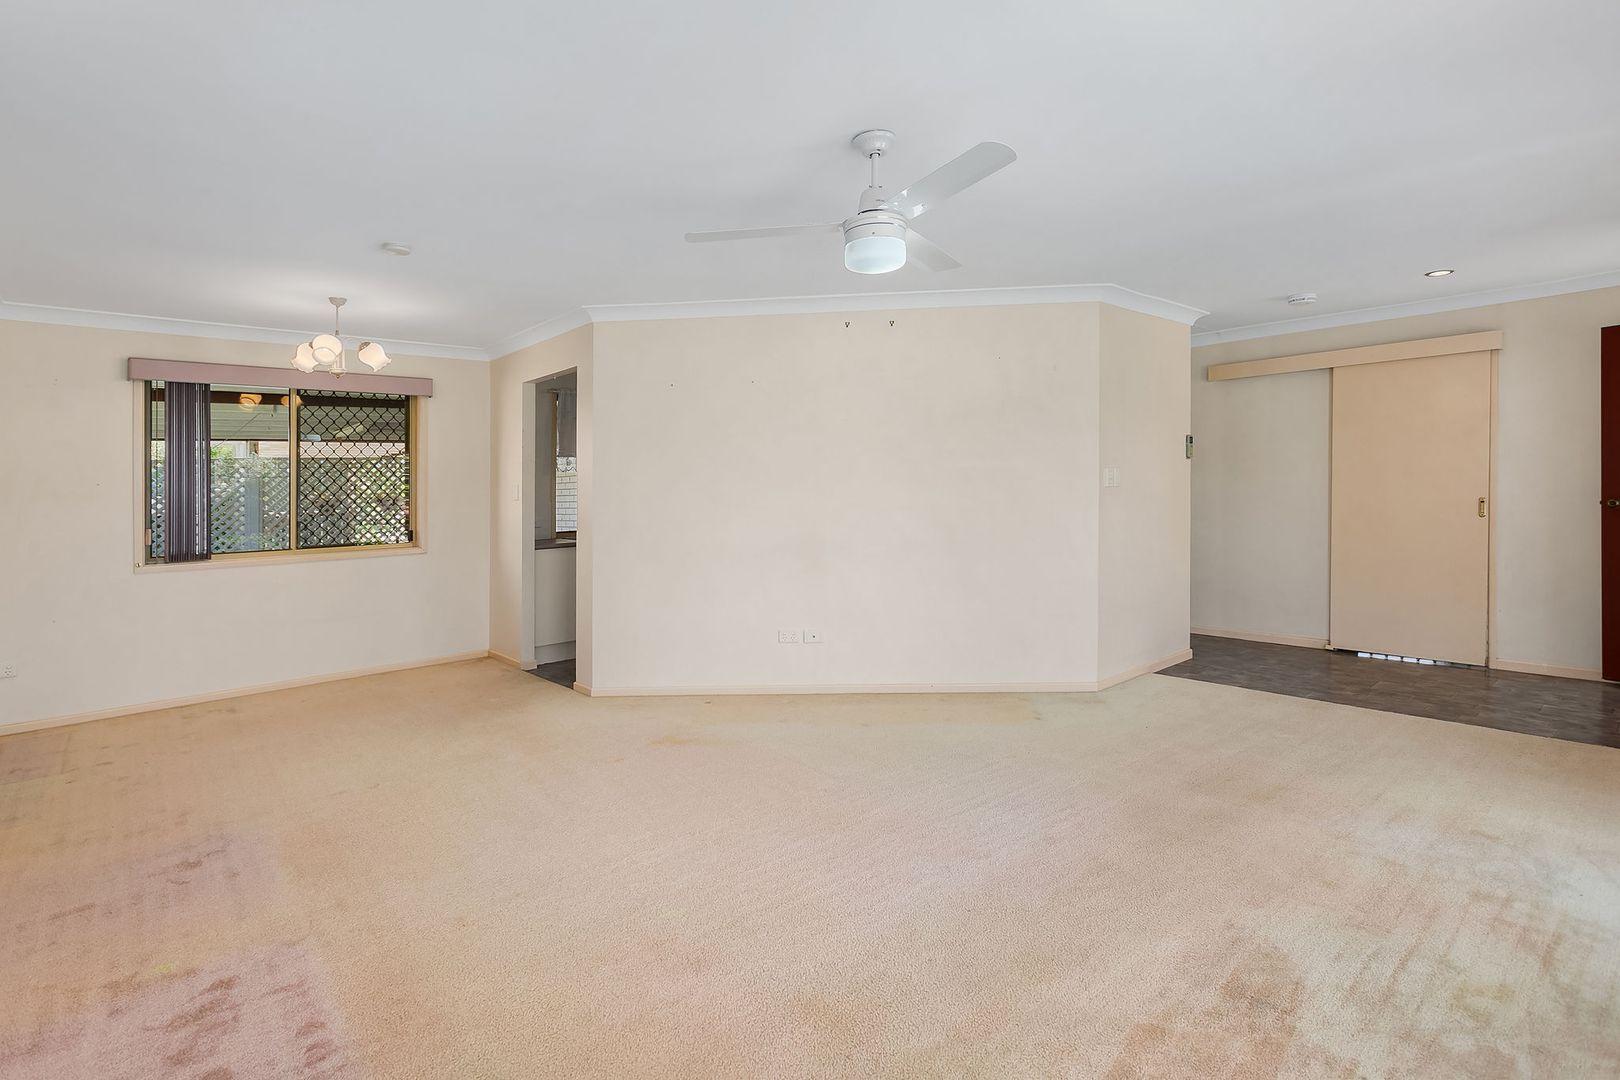 22 Jackwitz Road, Lowood QLD 4311, Image 1